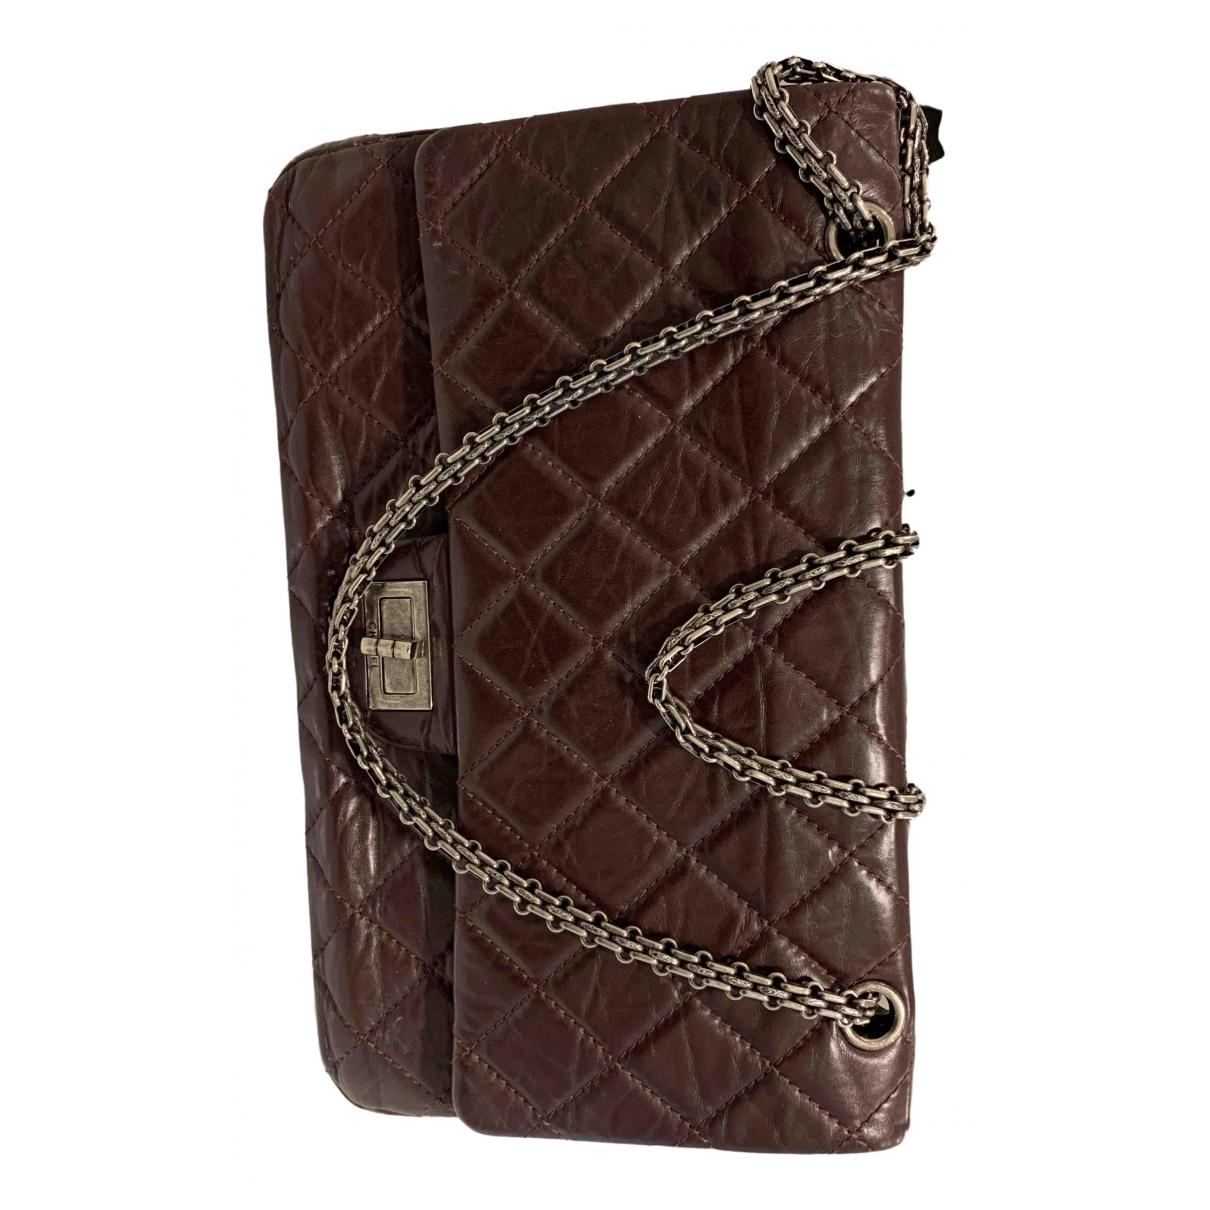 Chanel 2.55 Burgundy Leather handbag for Women \N